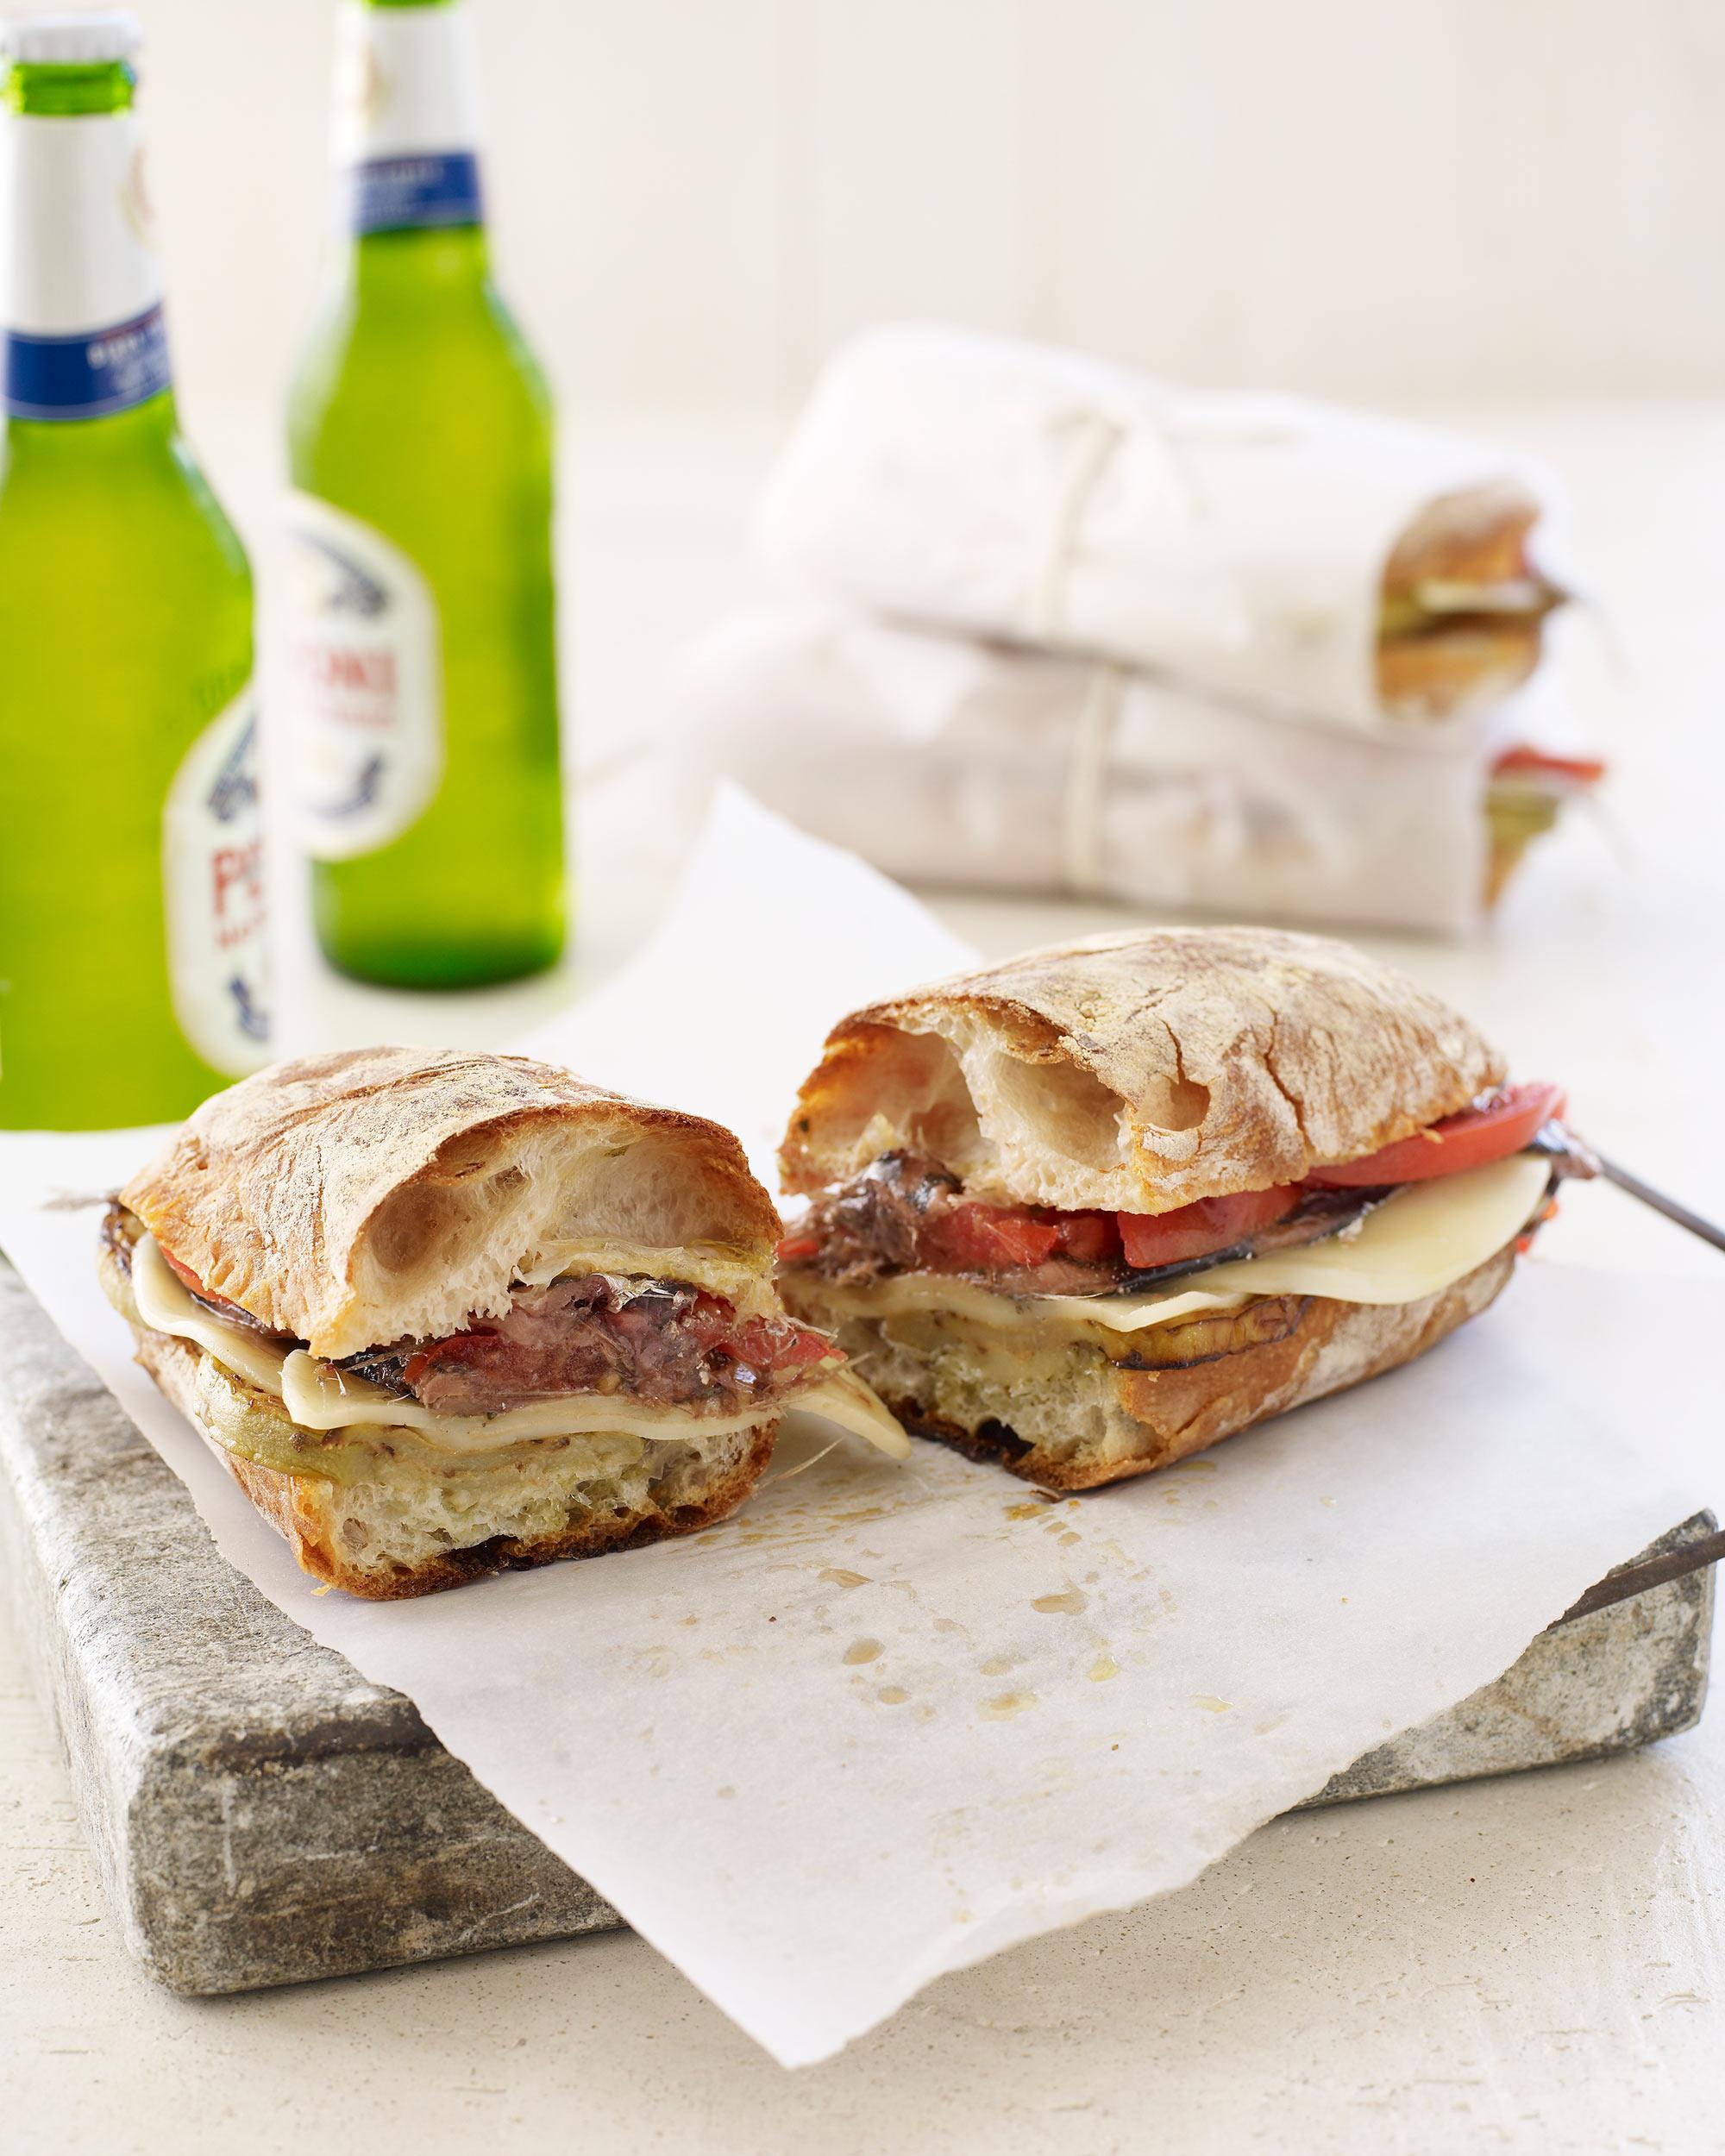 Seafood_Siciliana_Fish_Sandwich_MollyFitzSimons_PropStylist.jpg